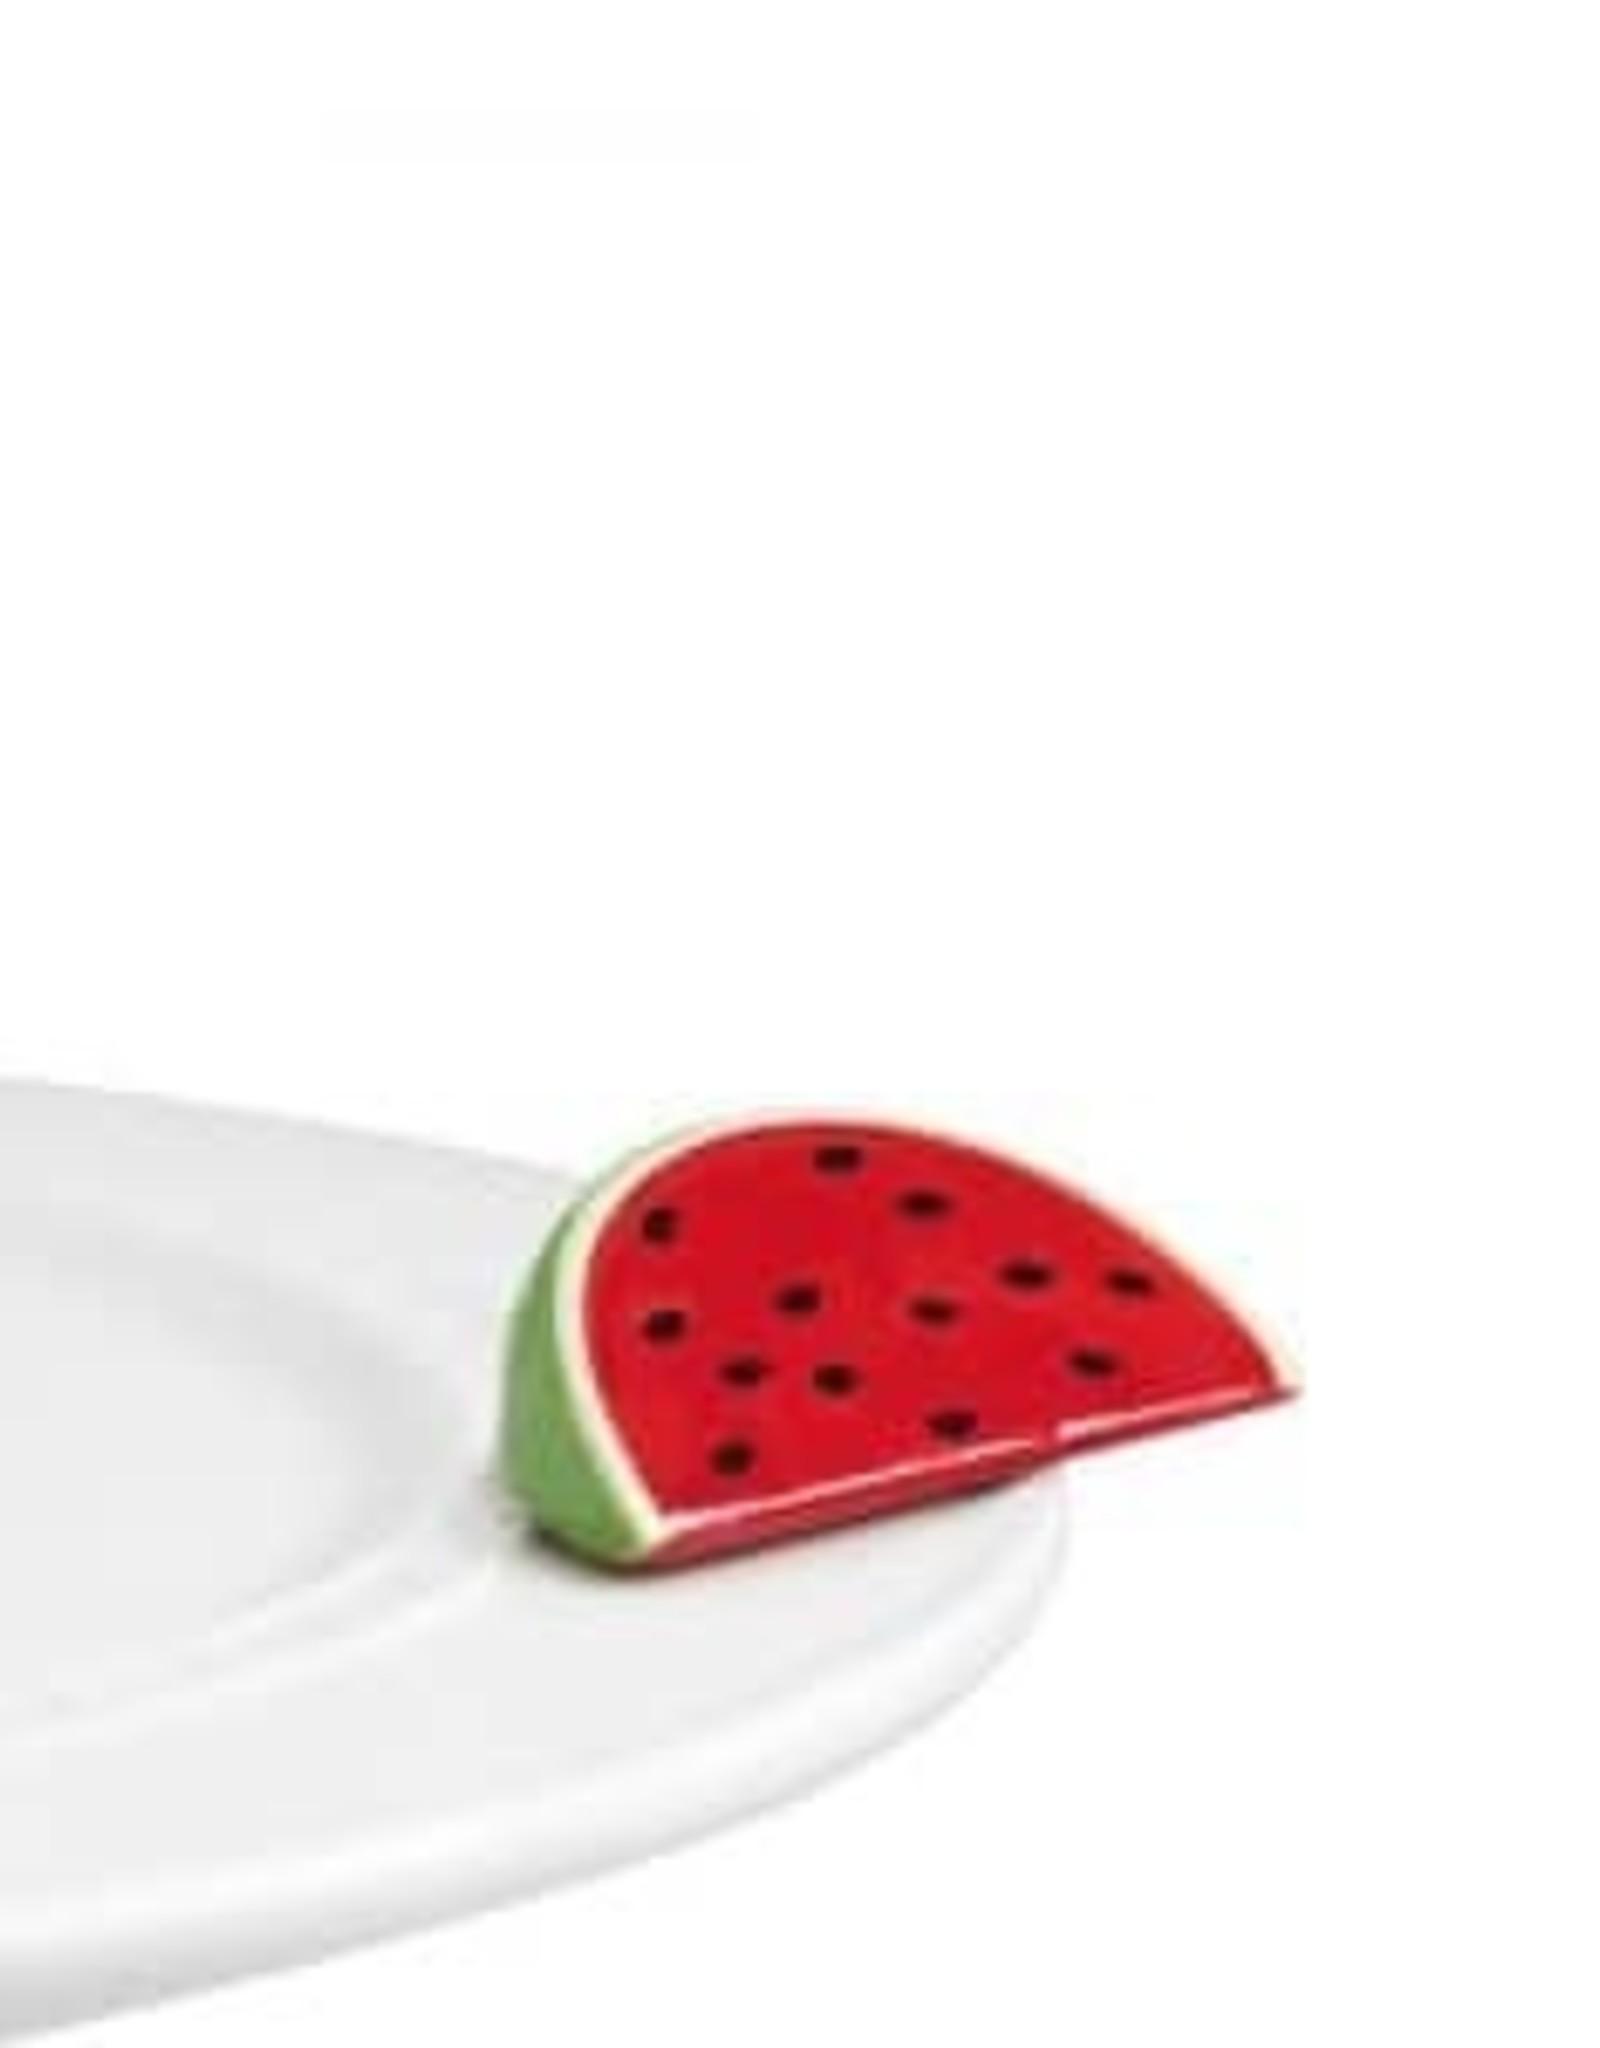 Nora Fleming taste of summer (watermelon)